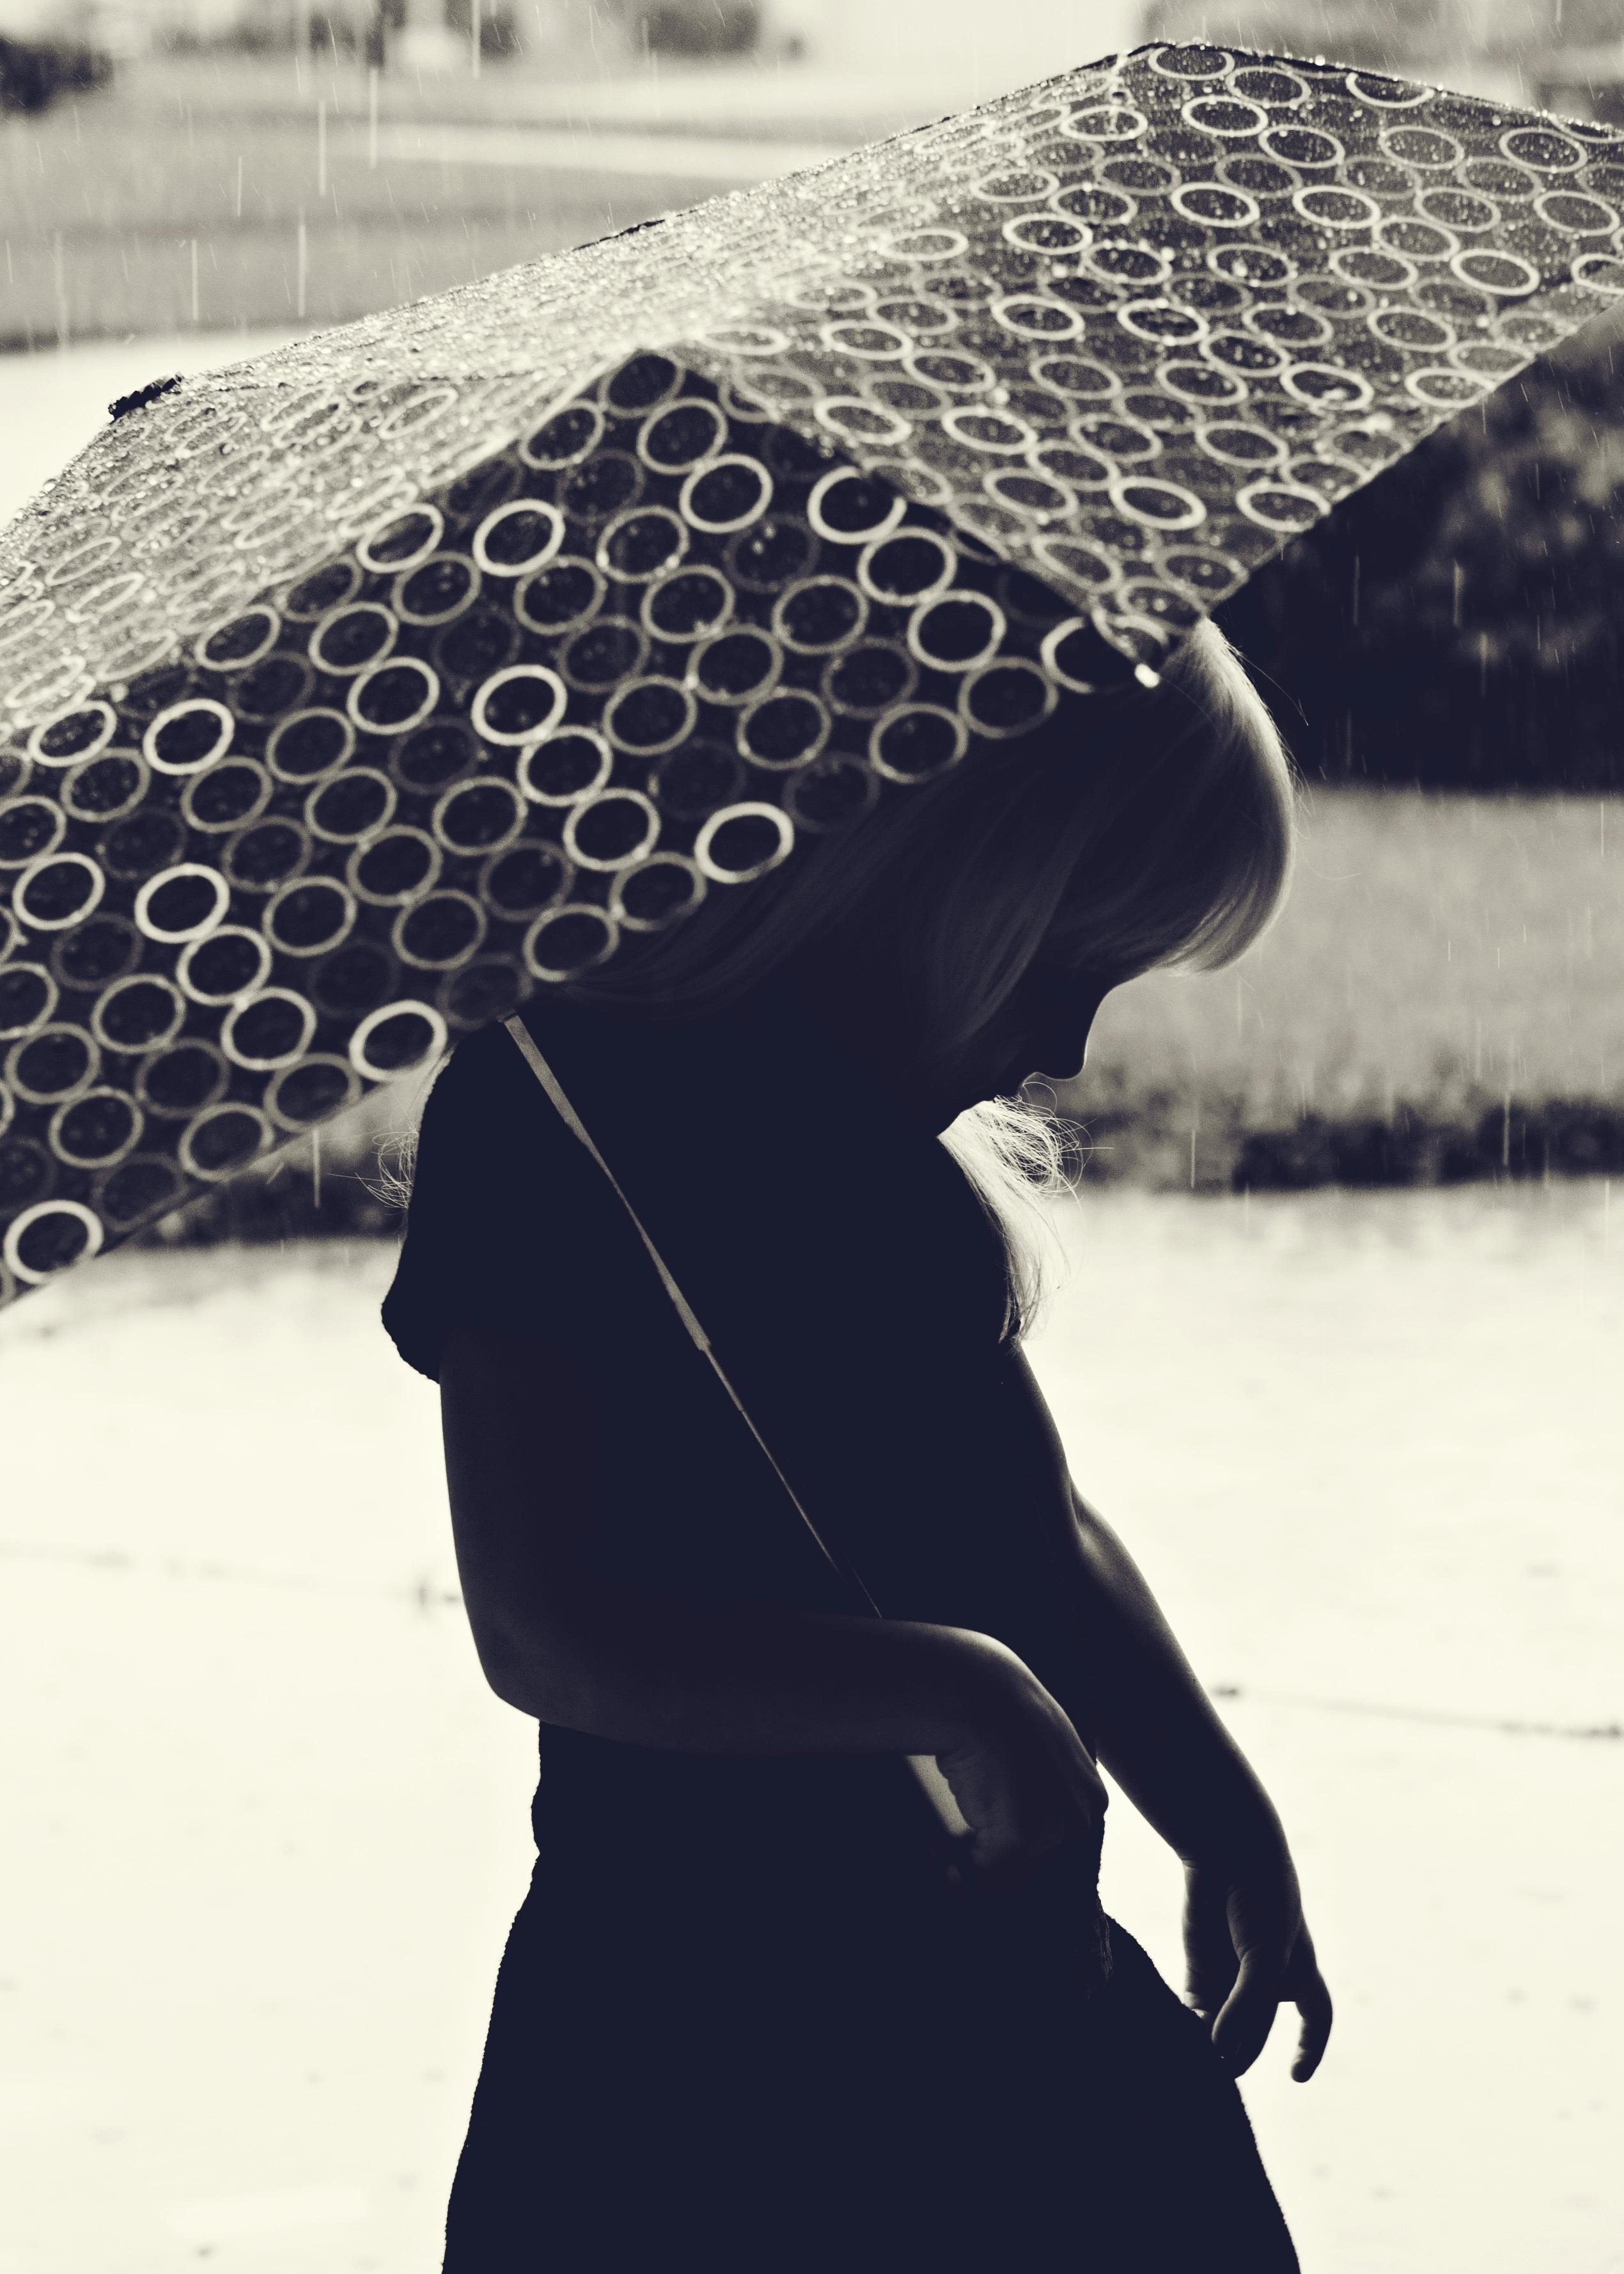 Gambar Salju Musim Dingin Hitam Dan Putih Gadis Hujan Murung Musim Semi Payung Cuaca Badai Bayangan Mode Pakaian Satu Warna Sedih Gaun Foto Depresi Tidak Bahagia Fotografi Monokrom Fashion Aksesori 2540x3556